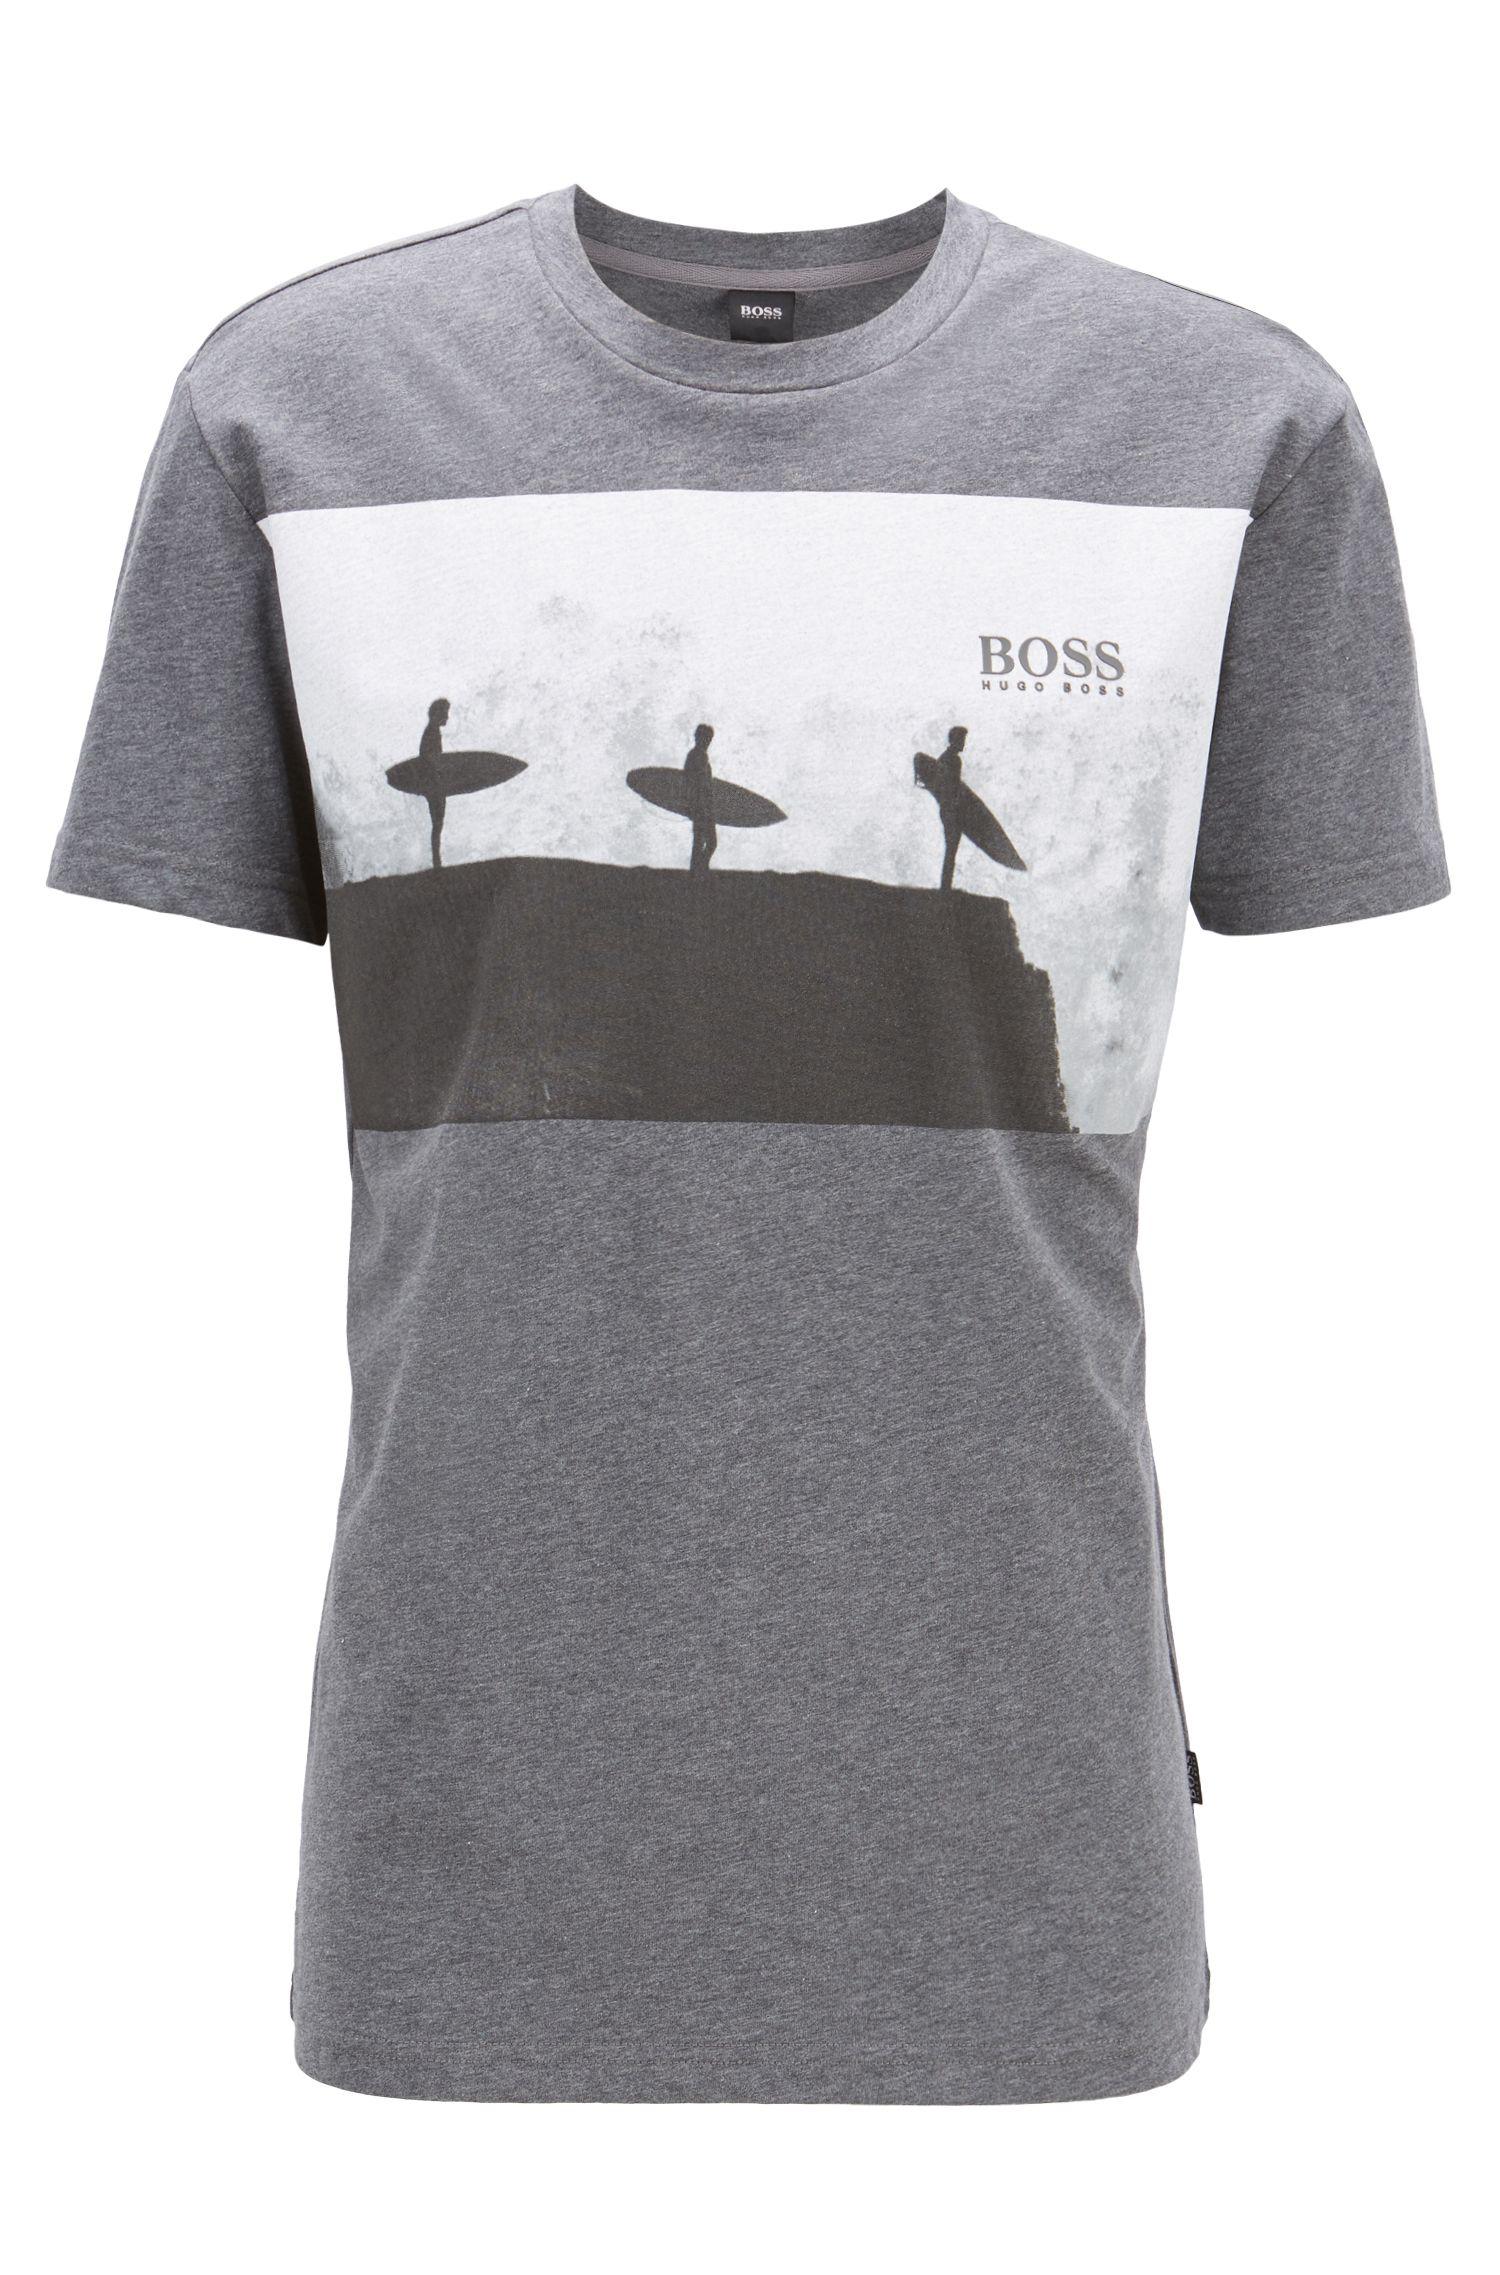 Relaxed-Fit T-Shirt aus melierter Baumwolle mit Strand-Motiv, Grau